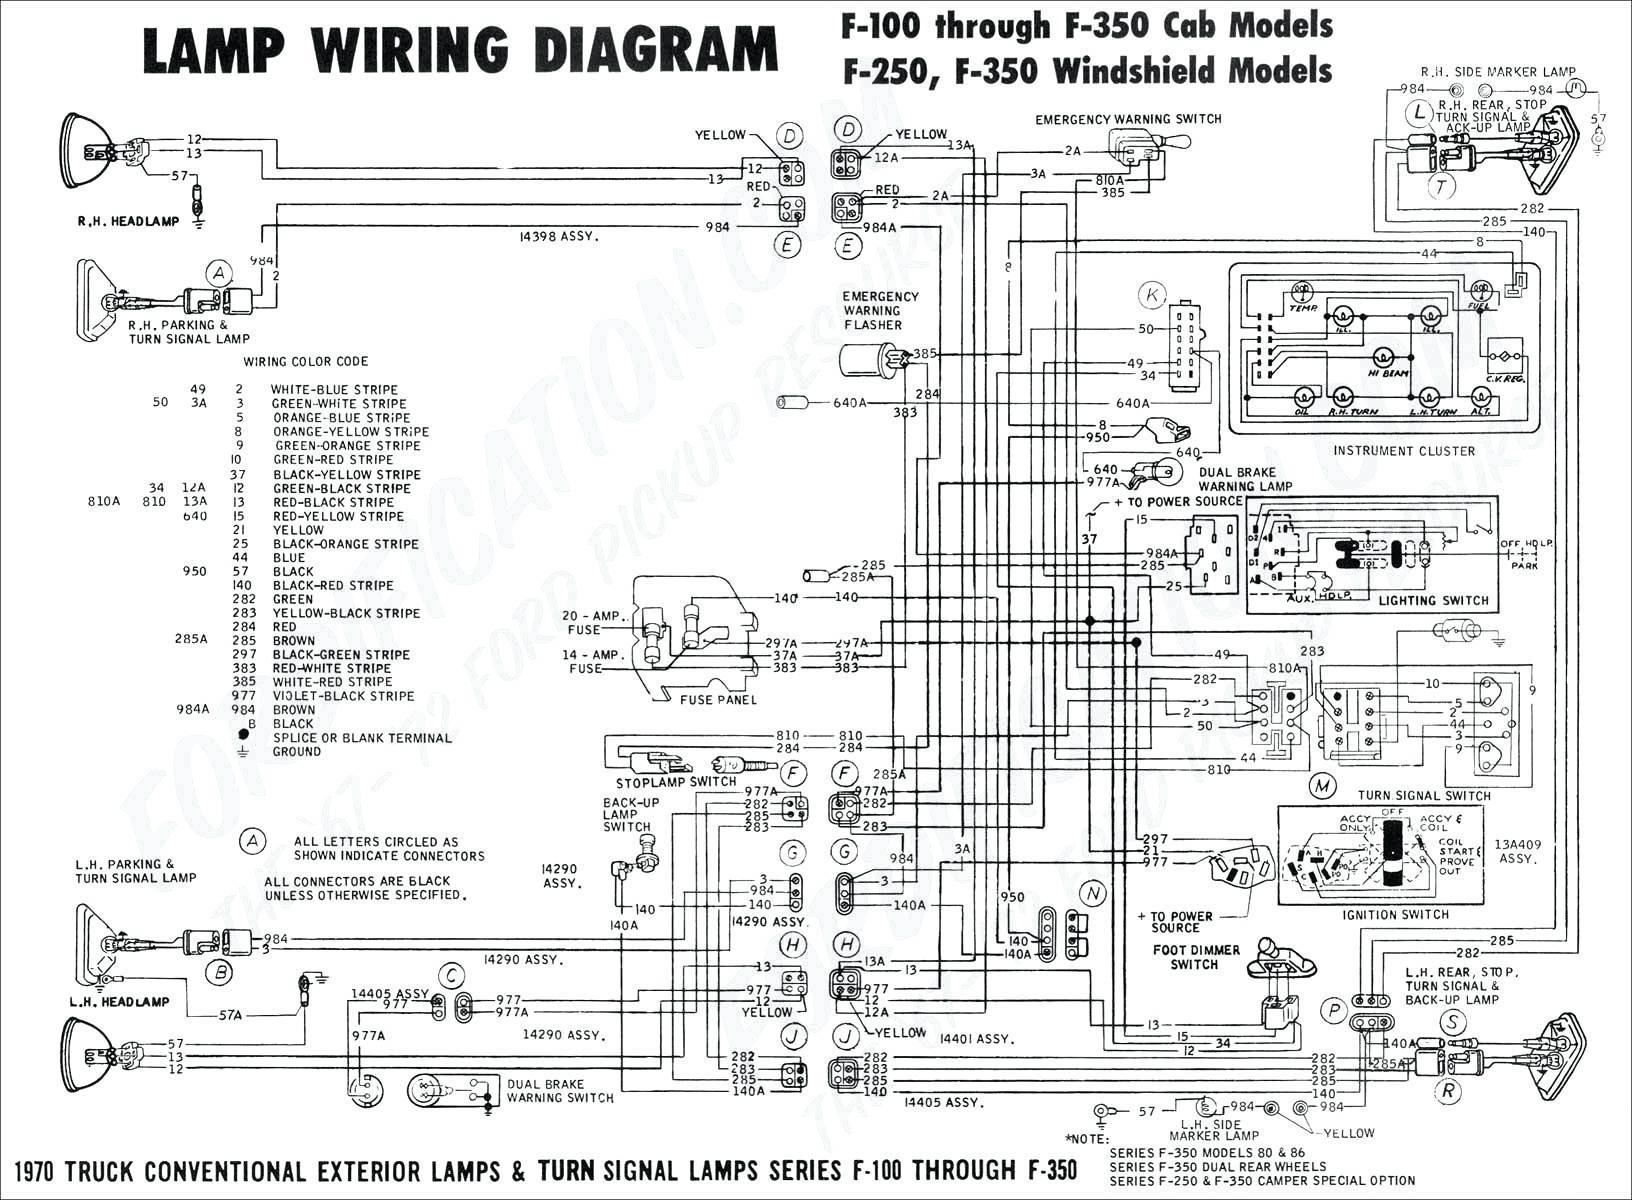 99 s10 wiring diagram plow truck we 7188  1986 chevy truck wiring diagram furthermore dodge ram  1986 chevy truck wiring diagram